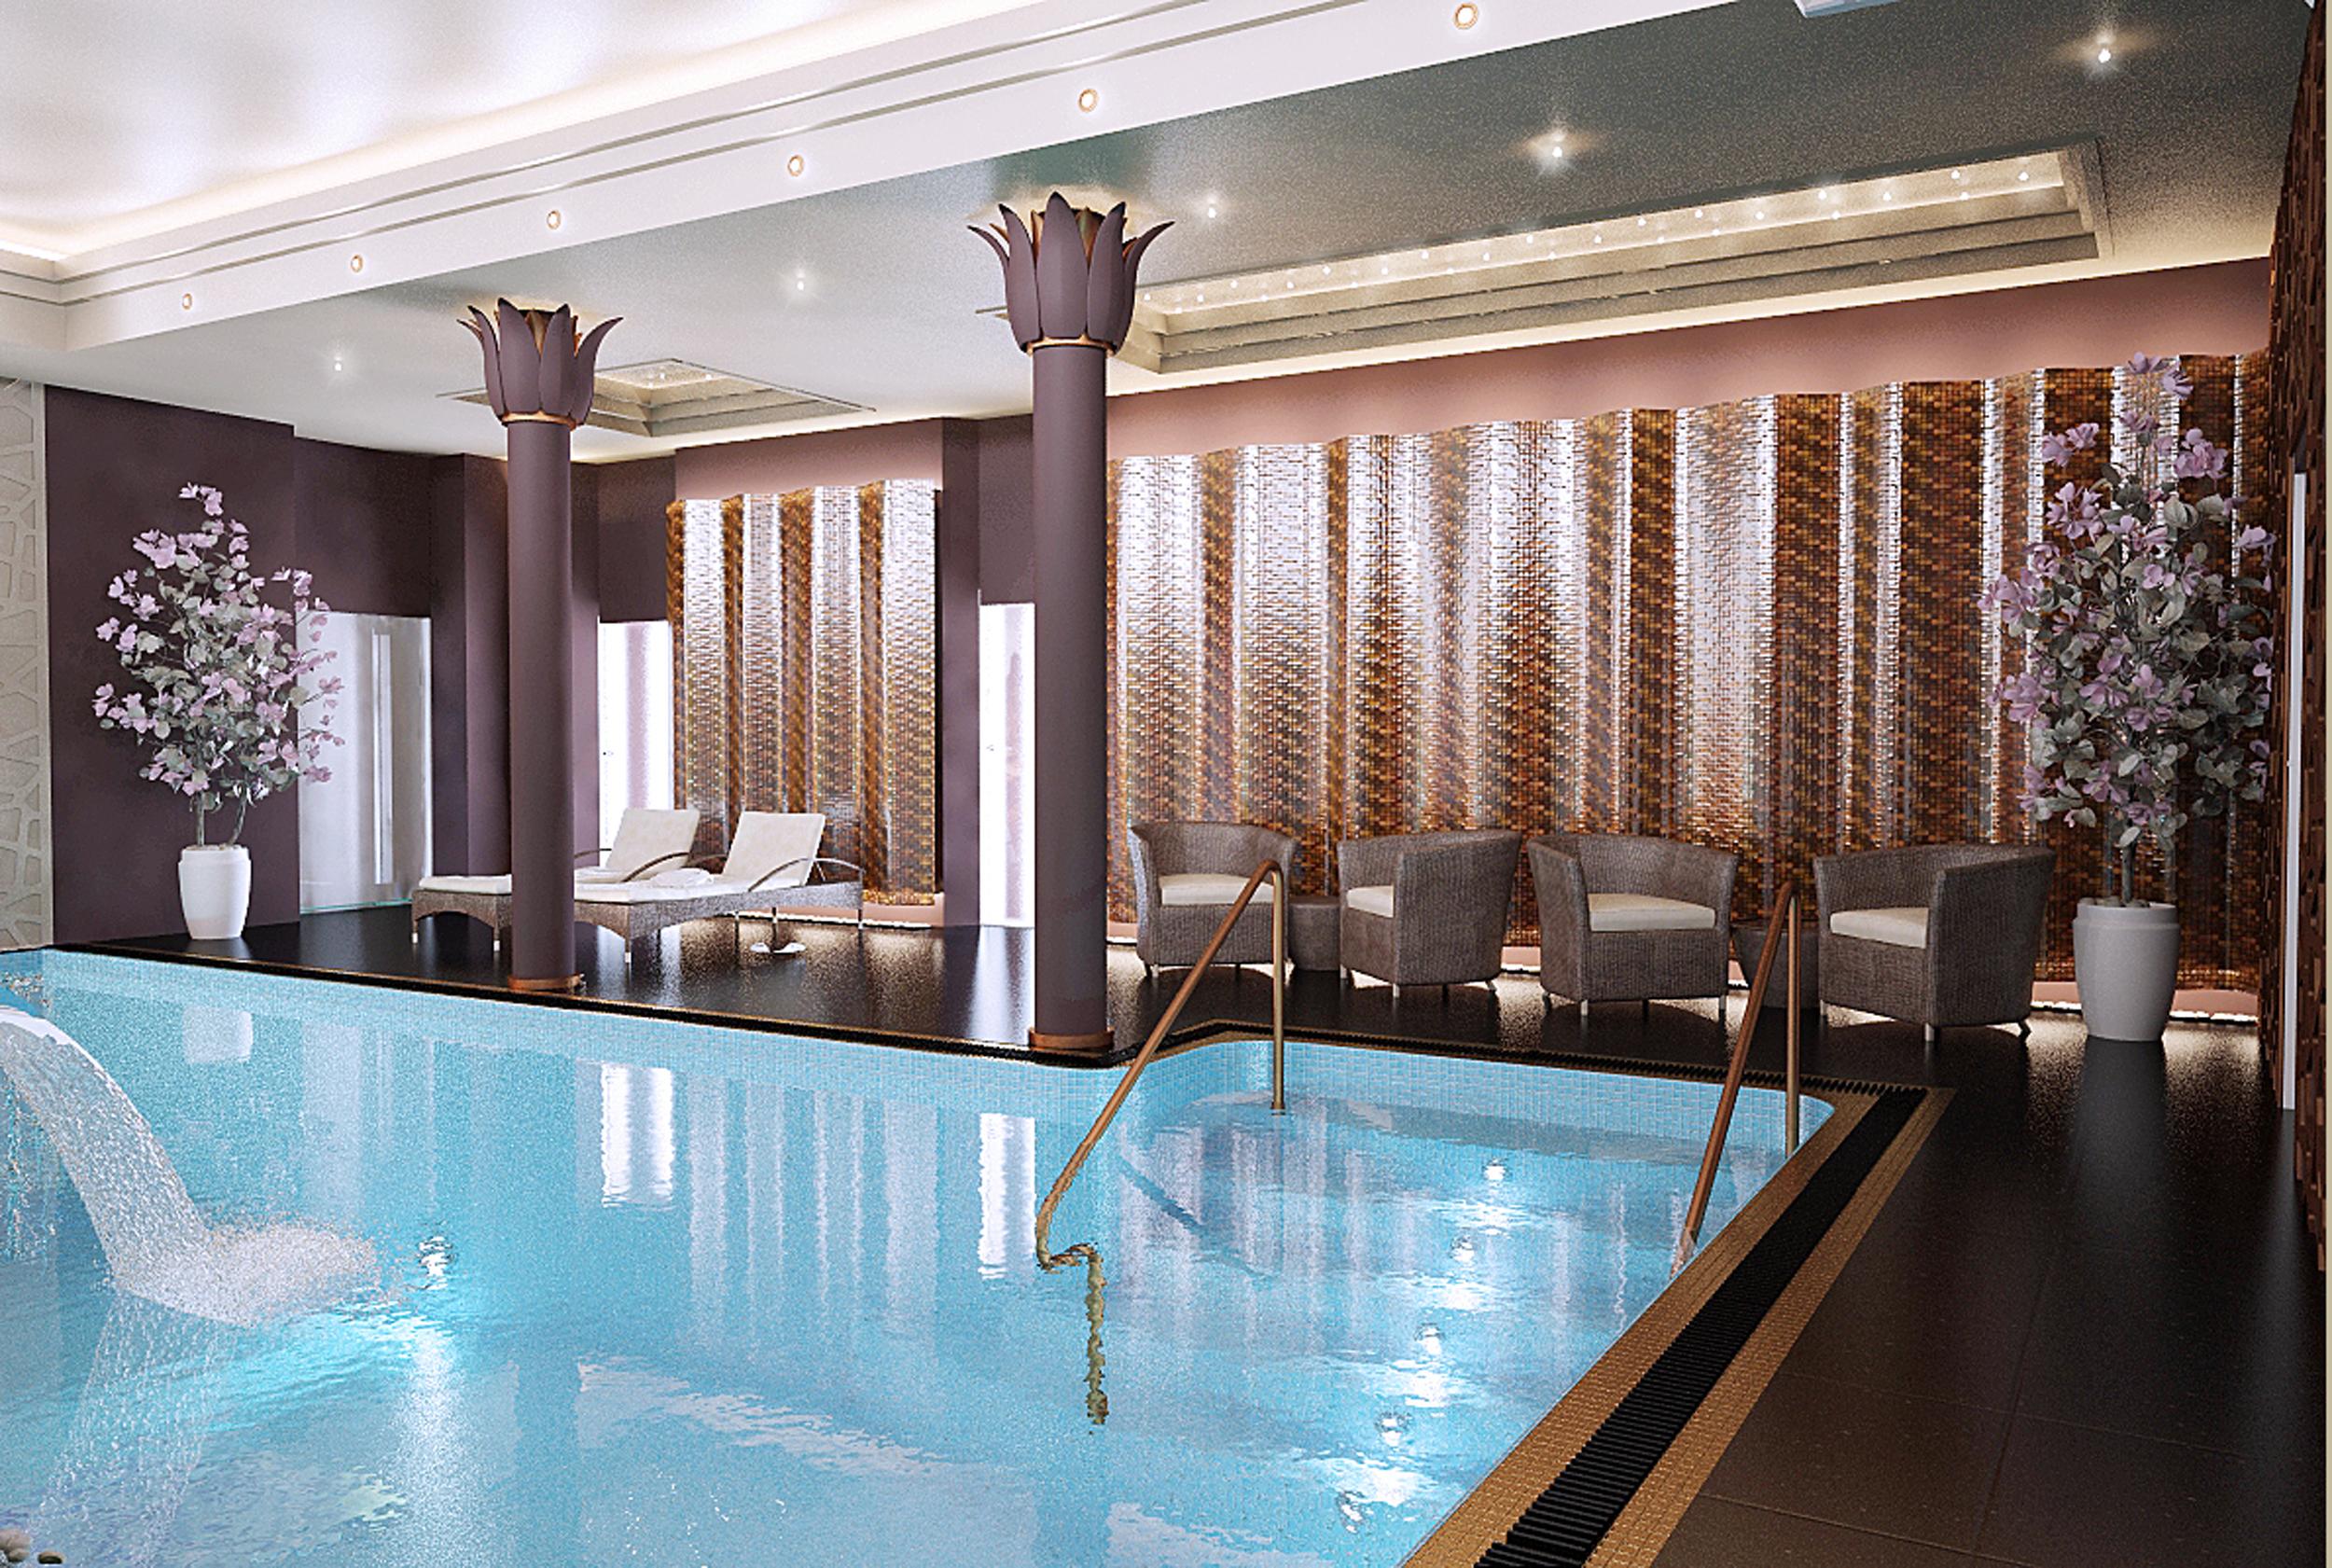 Hotel Royal Residence Royal Residence Hotel Spa Eesti Hotellide Ja Restoranide Liit